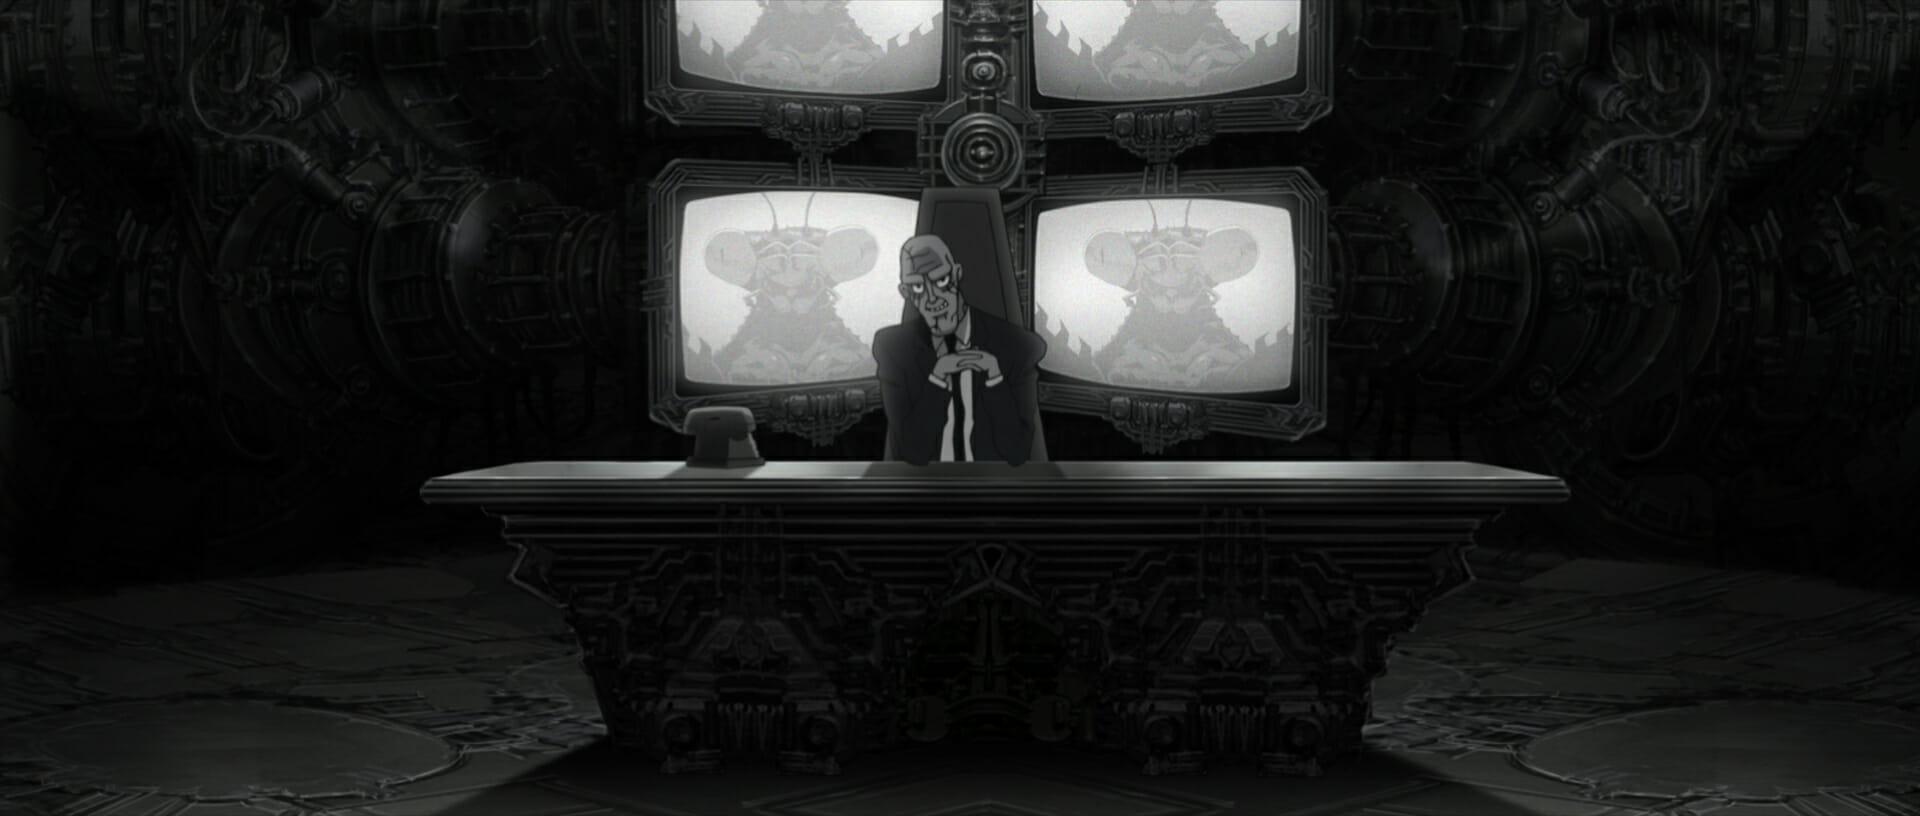 MFKZ  - cinema release